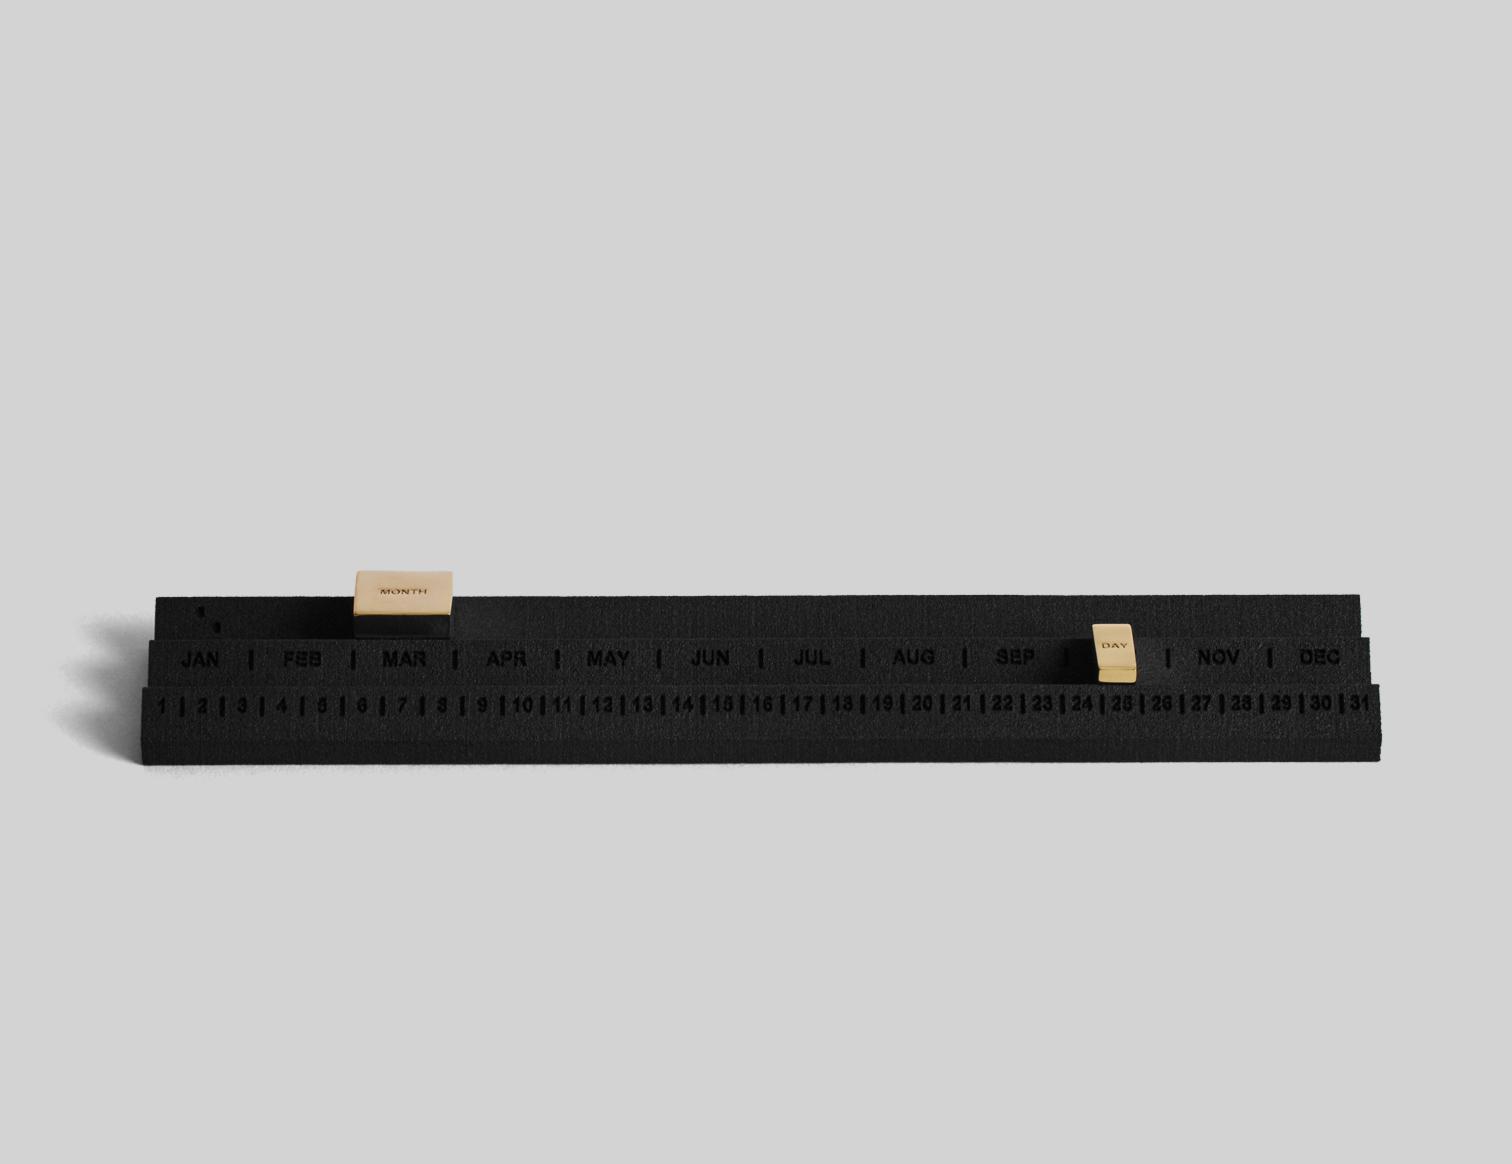 yonoh-othr-perpetuum-calendar-gift-3dprint-gold-5